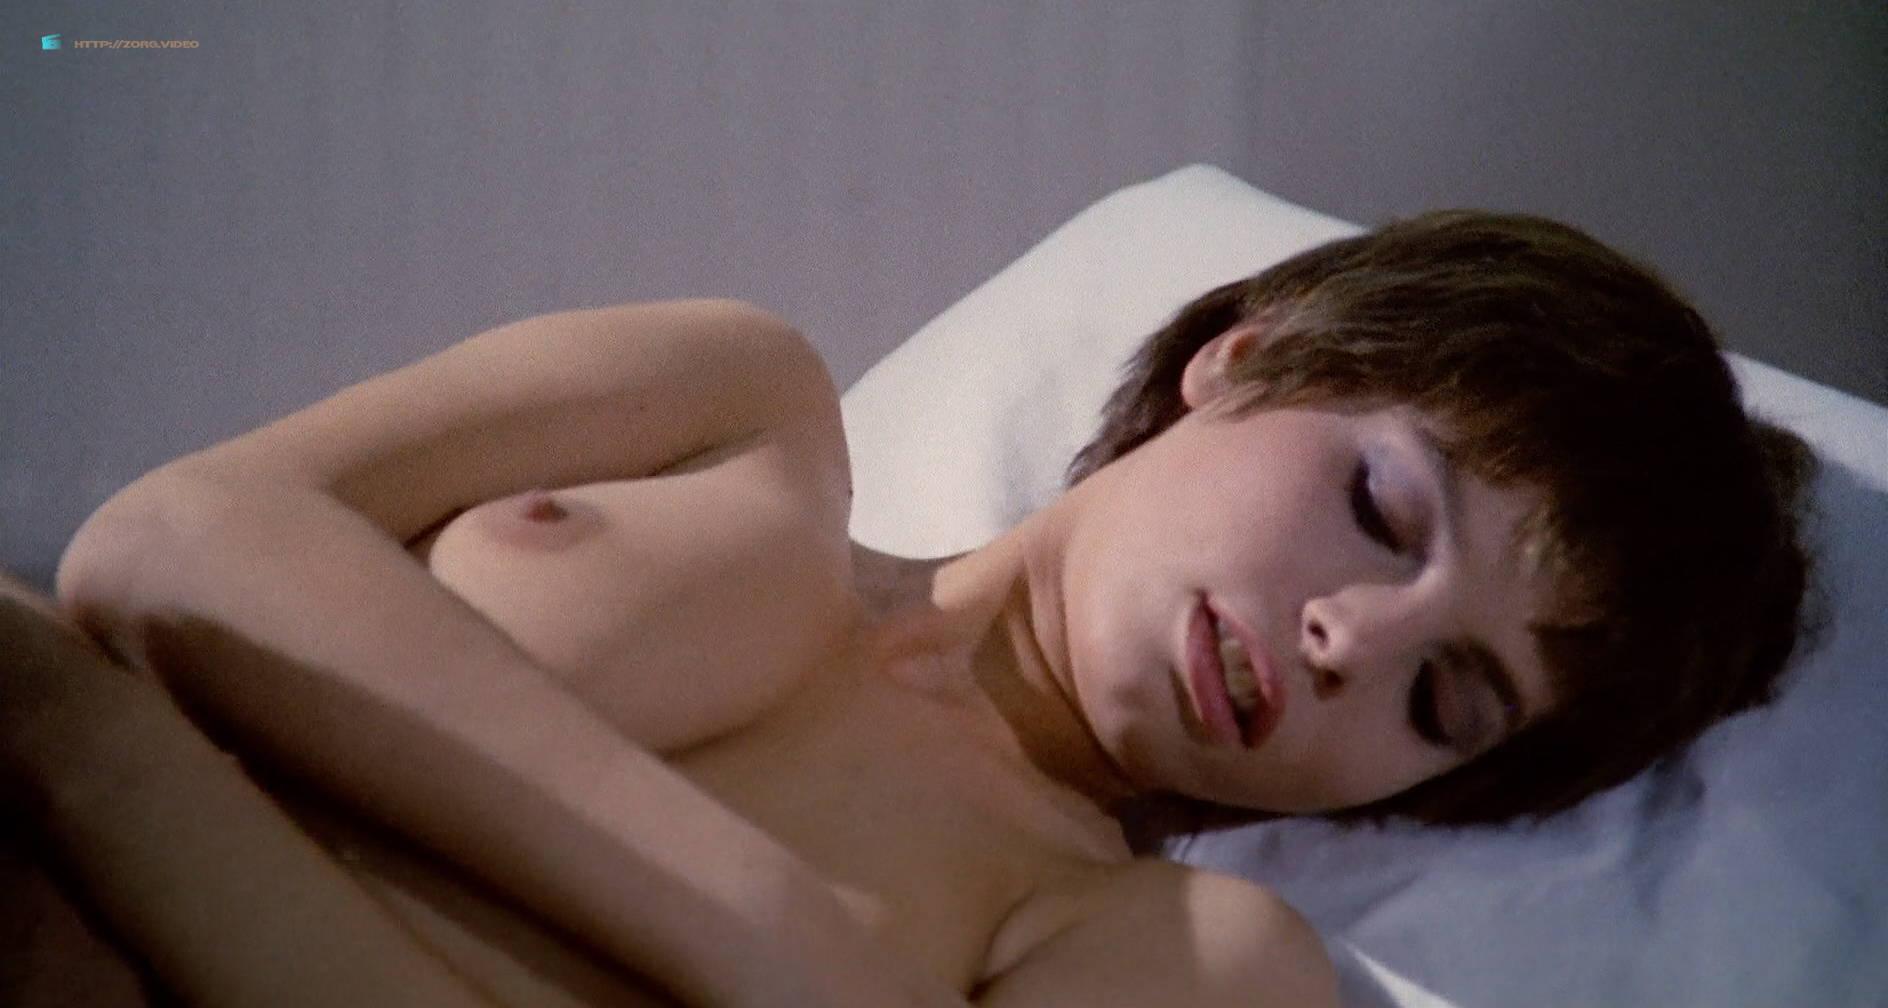 Paola Morra nude full frontal Anita Ekberg sex - Killer Nun (IT-1978) HD 1080p BluRay (3)